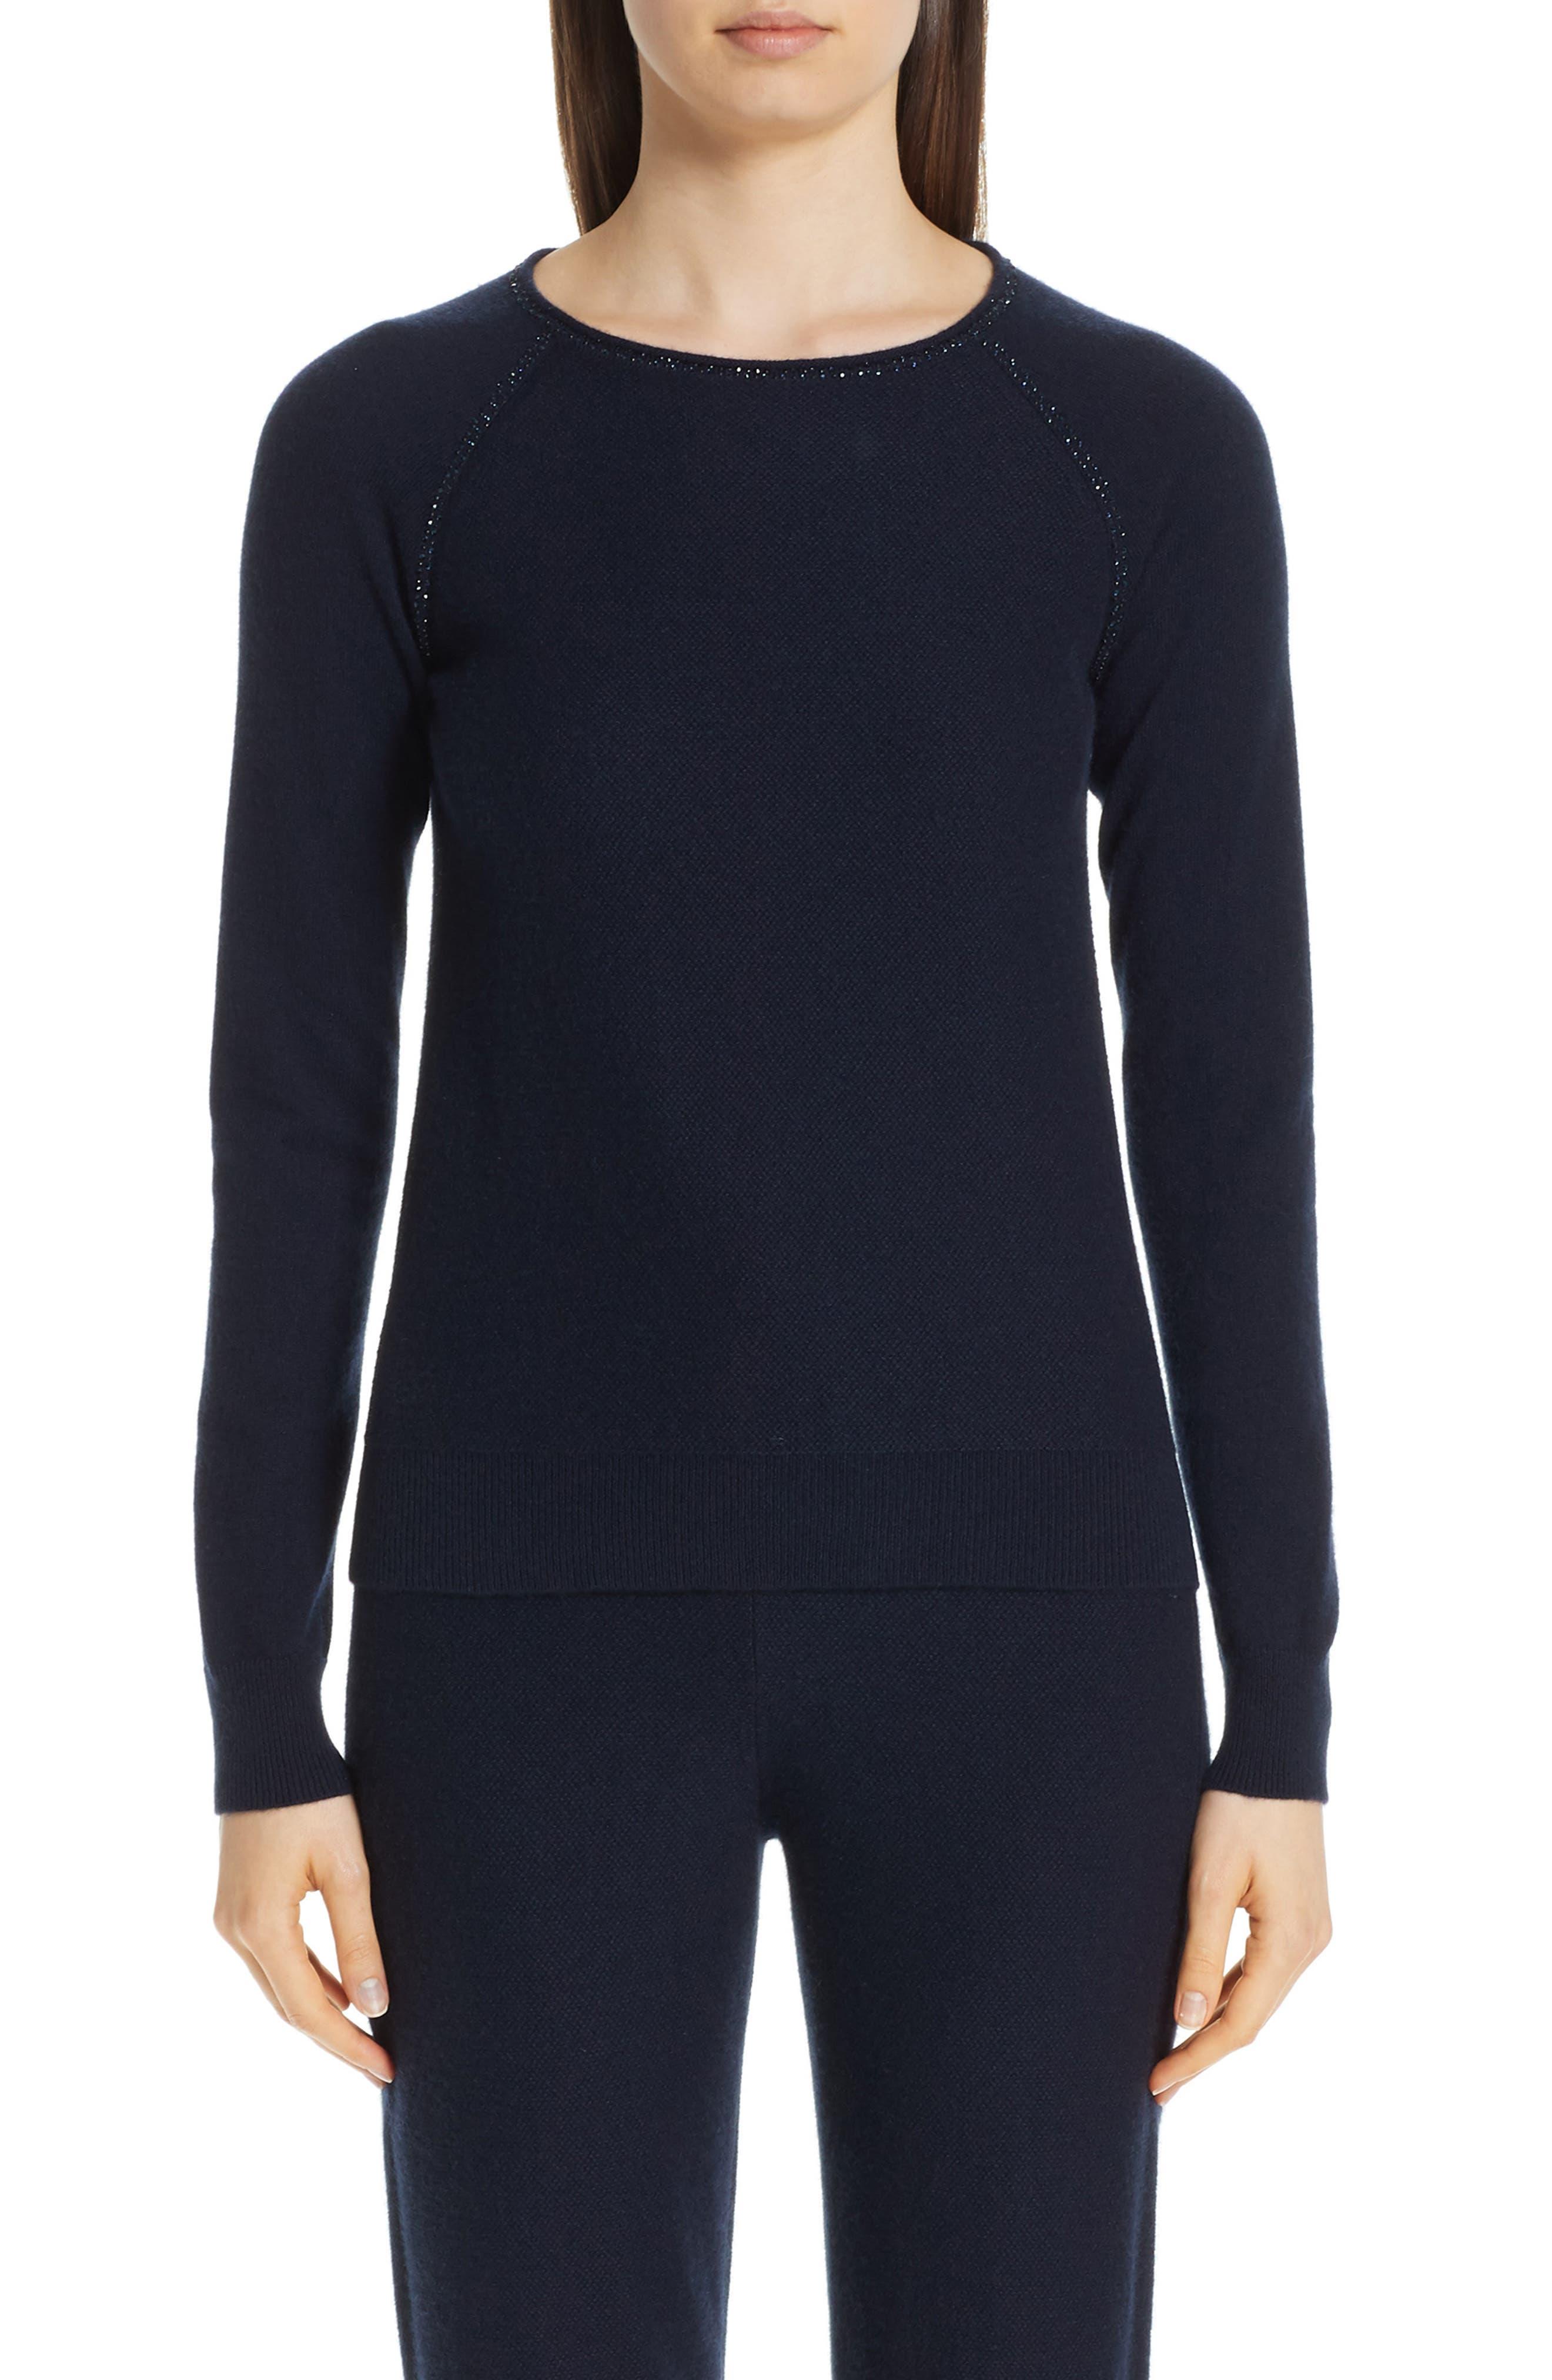 Cashmere Raglan Sweater,                             Main thumbnail 1, color,                             NAVY